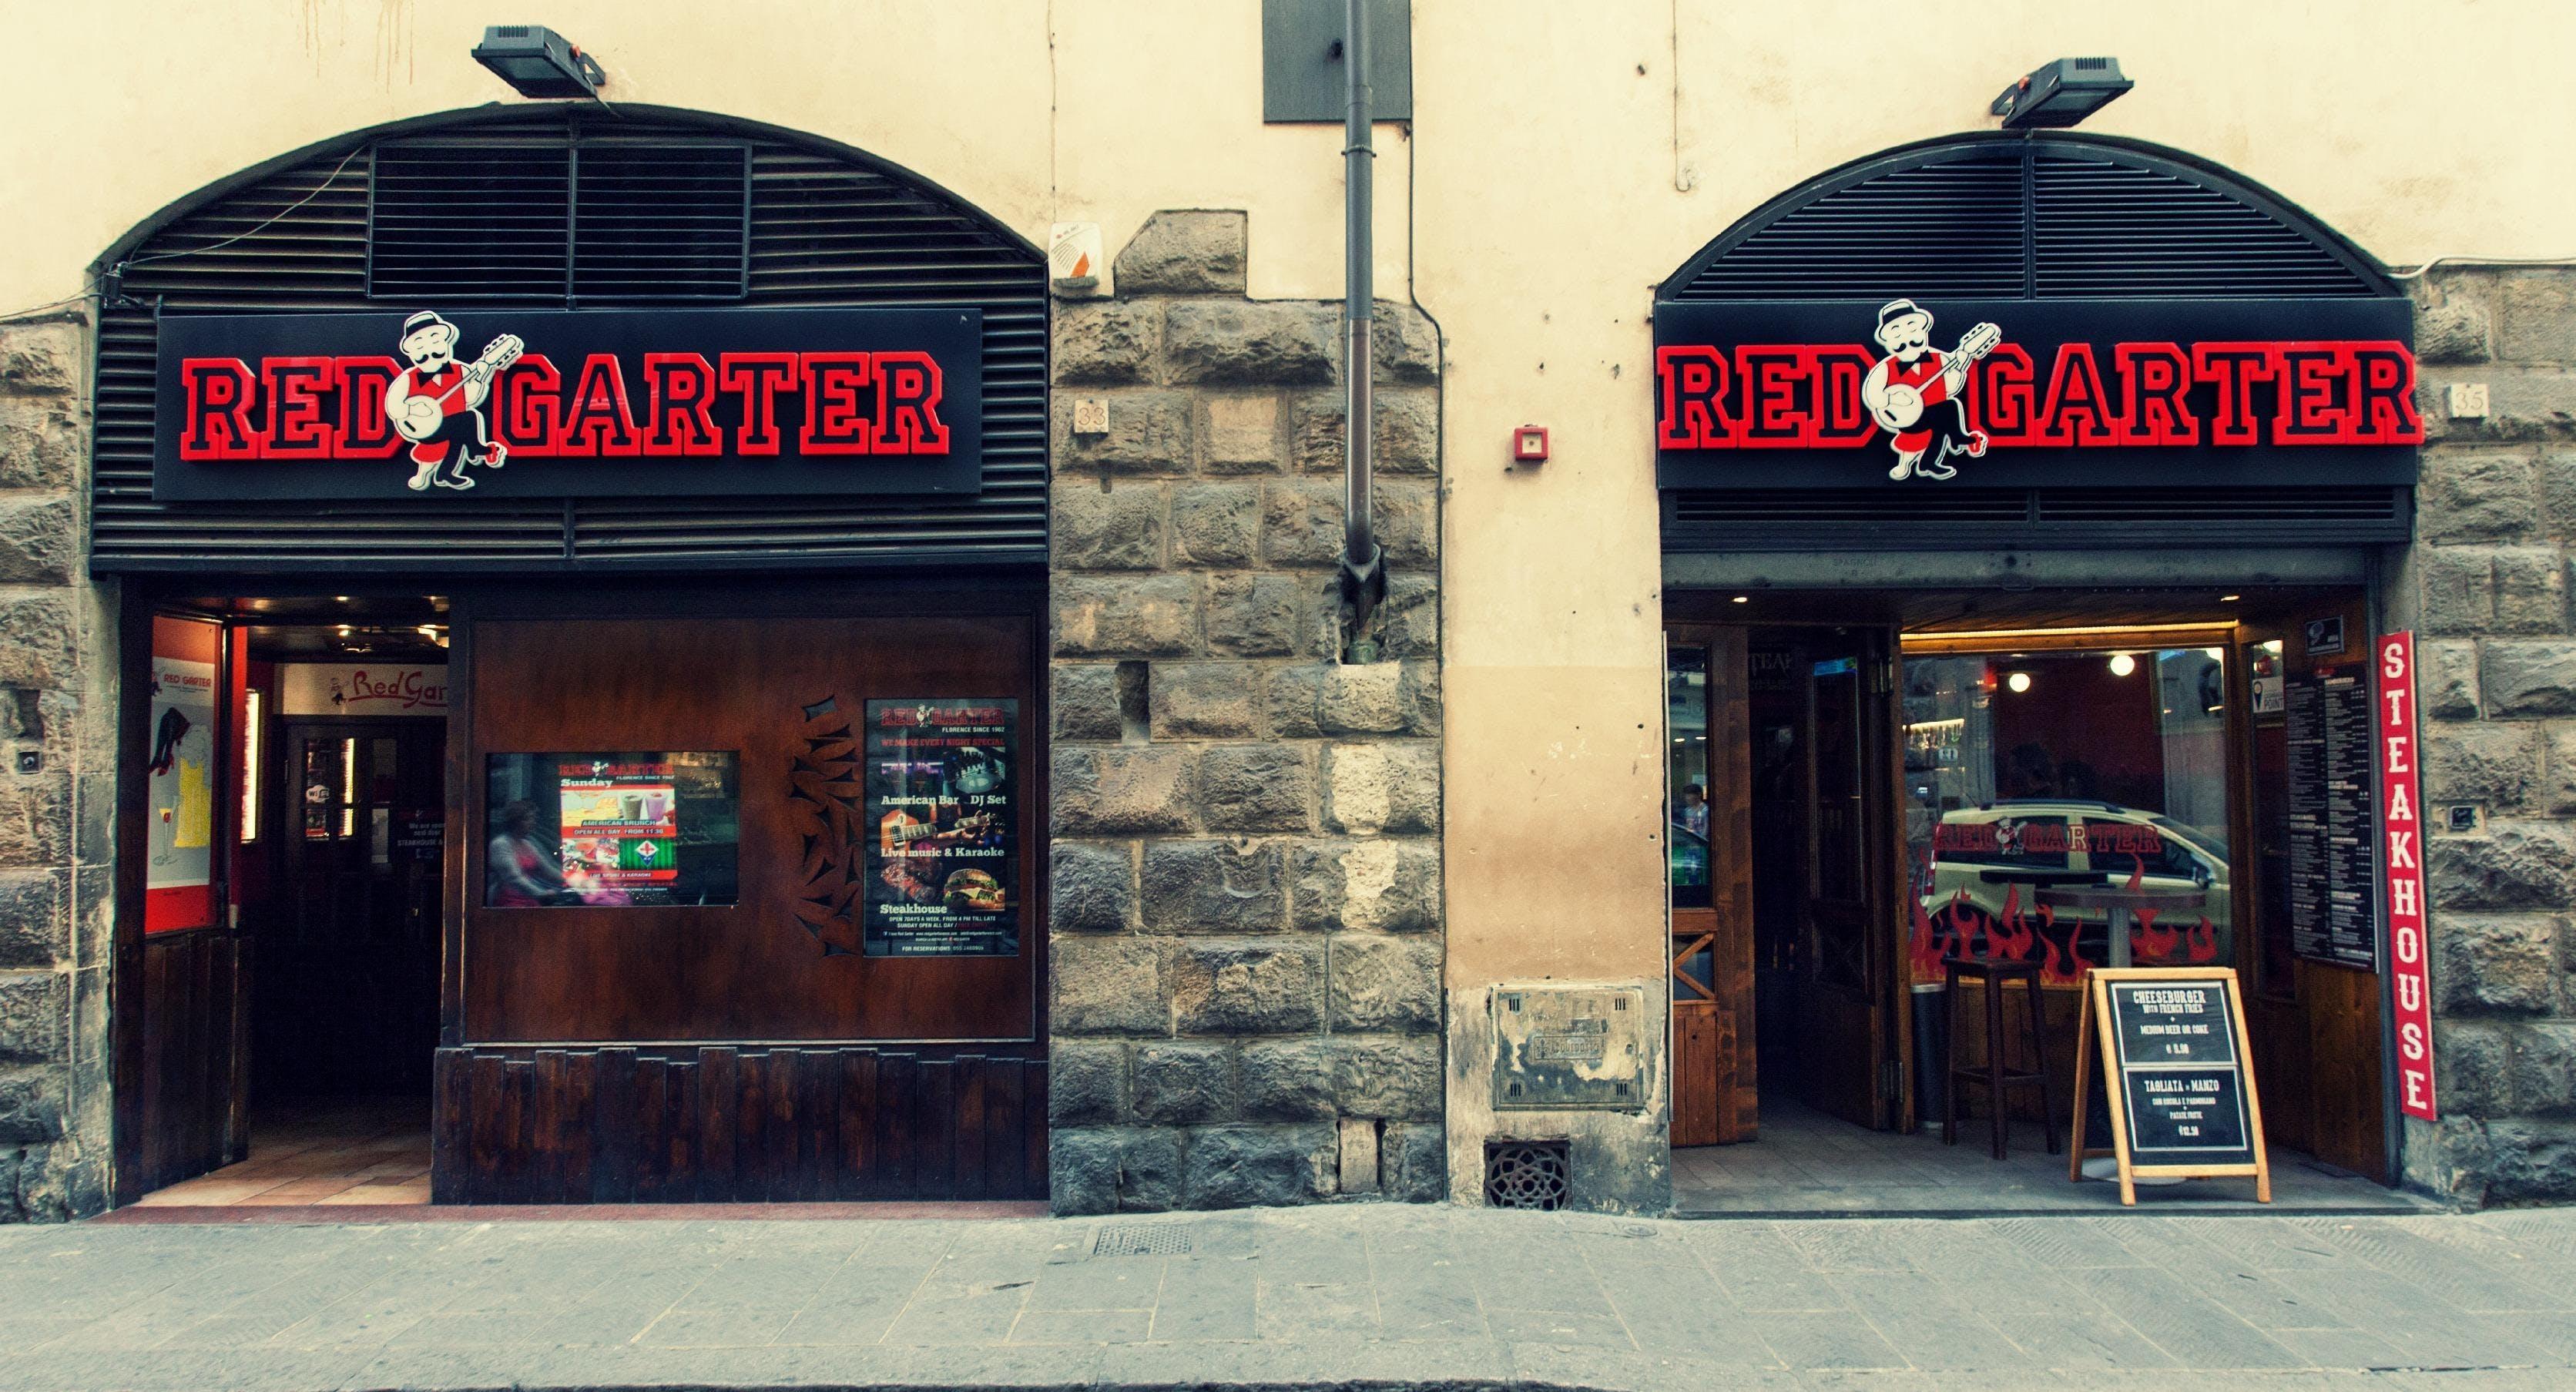 Red Garter